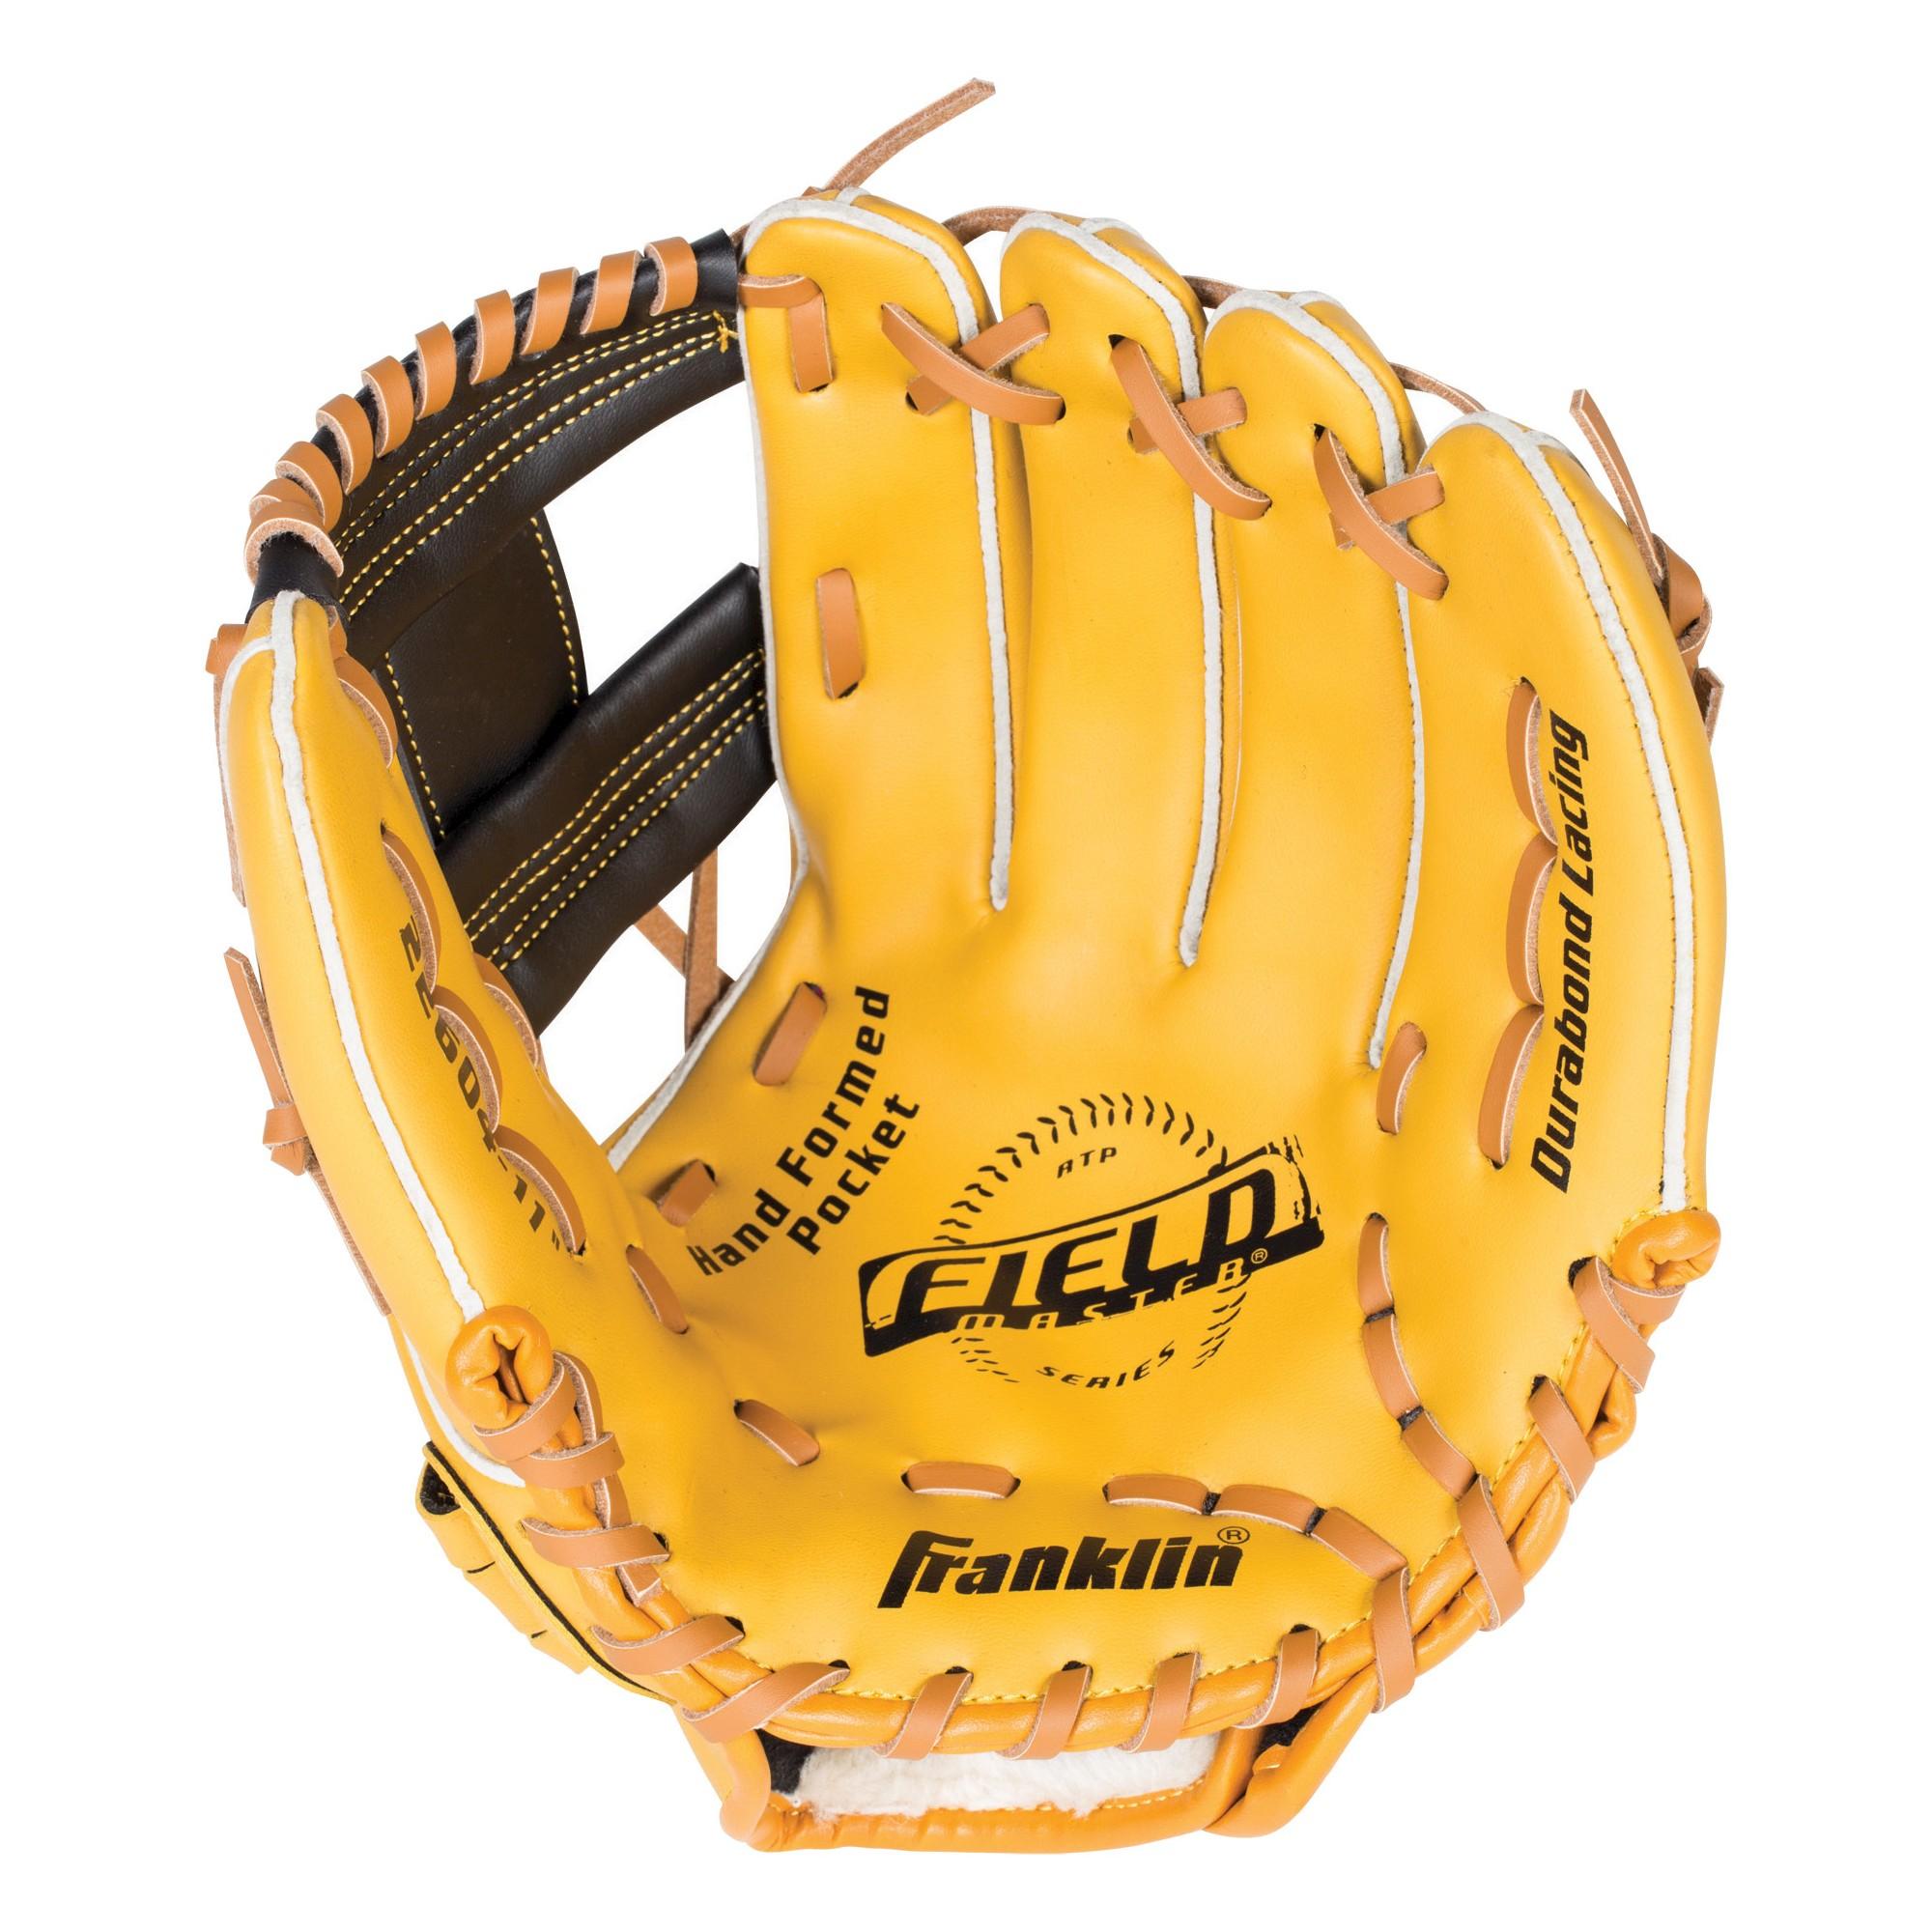 "Franklin Field Master Series 11.0/"" Baseball Glove Left-Hand Thrower"